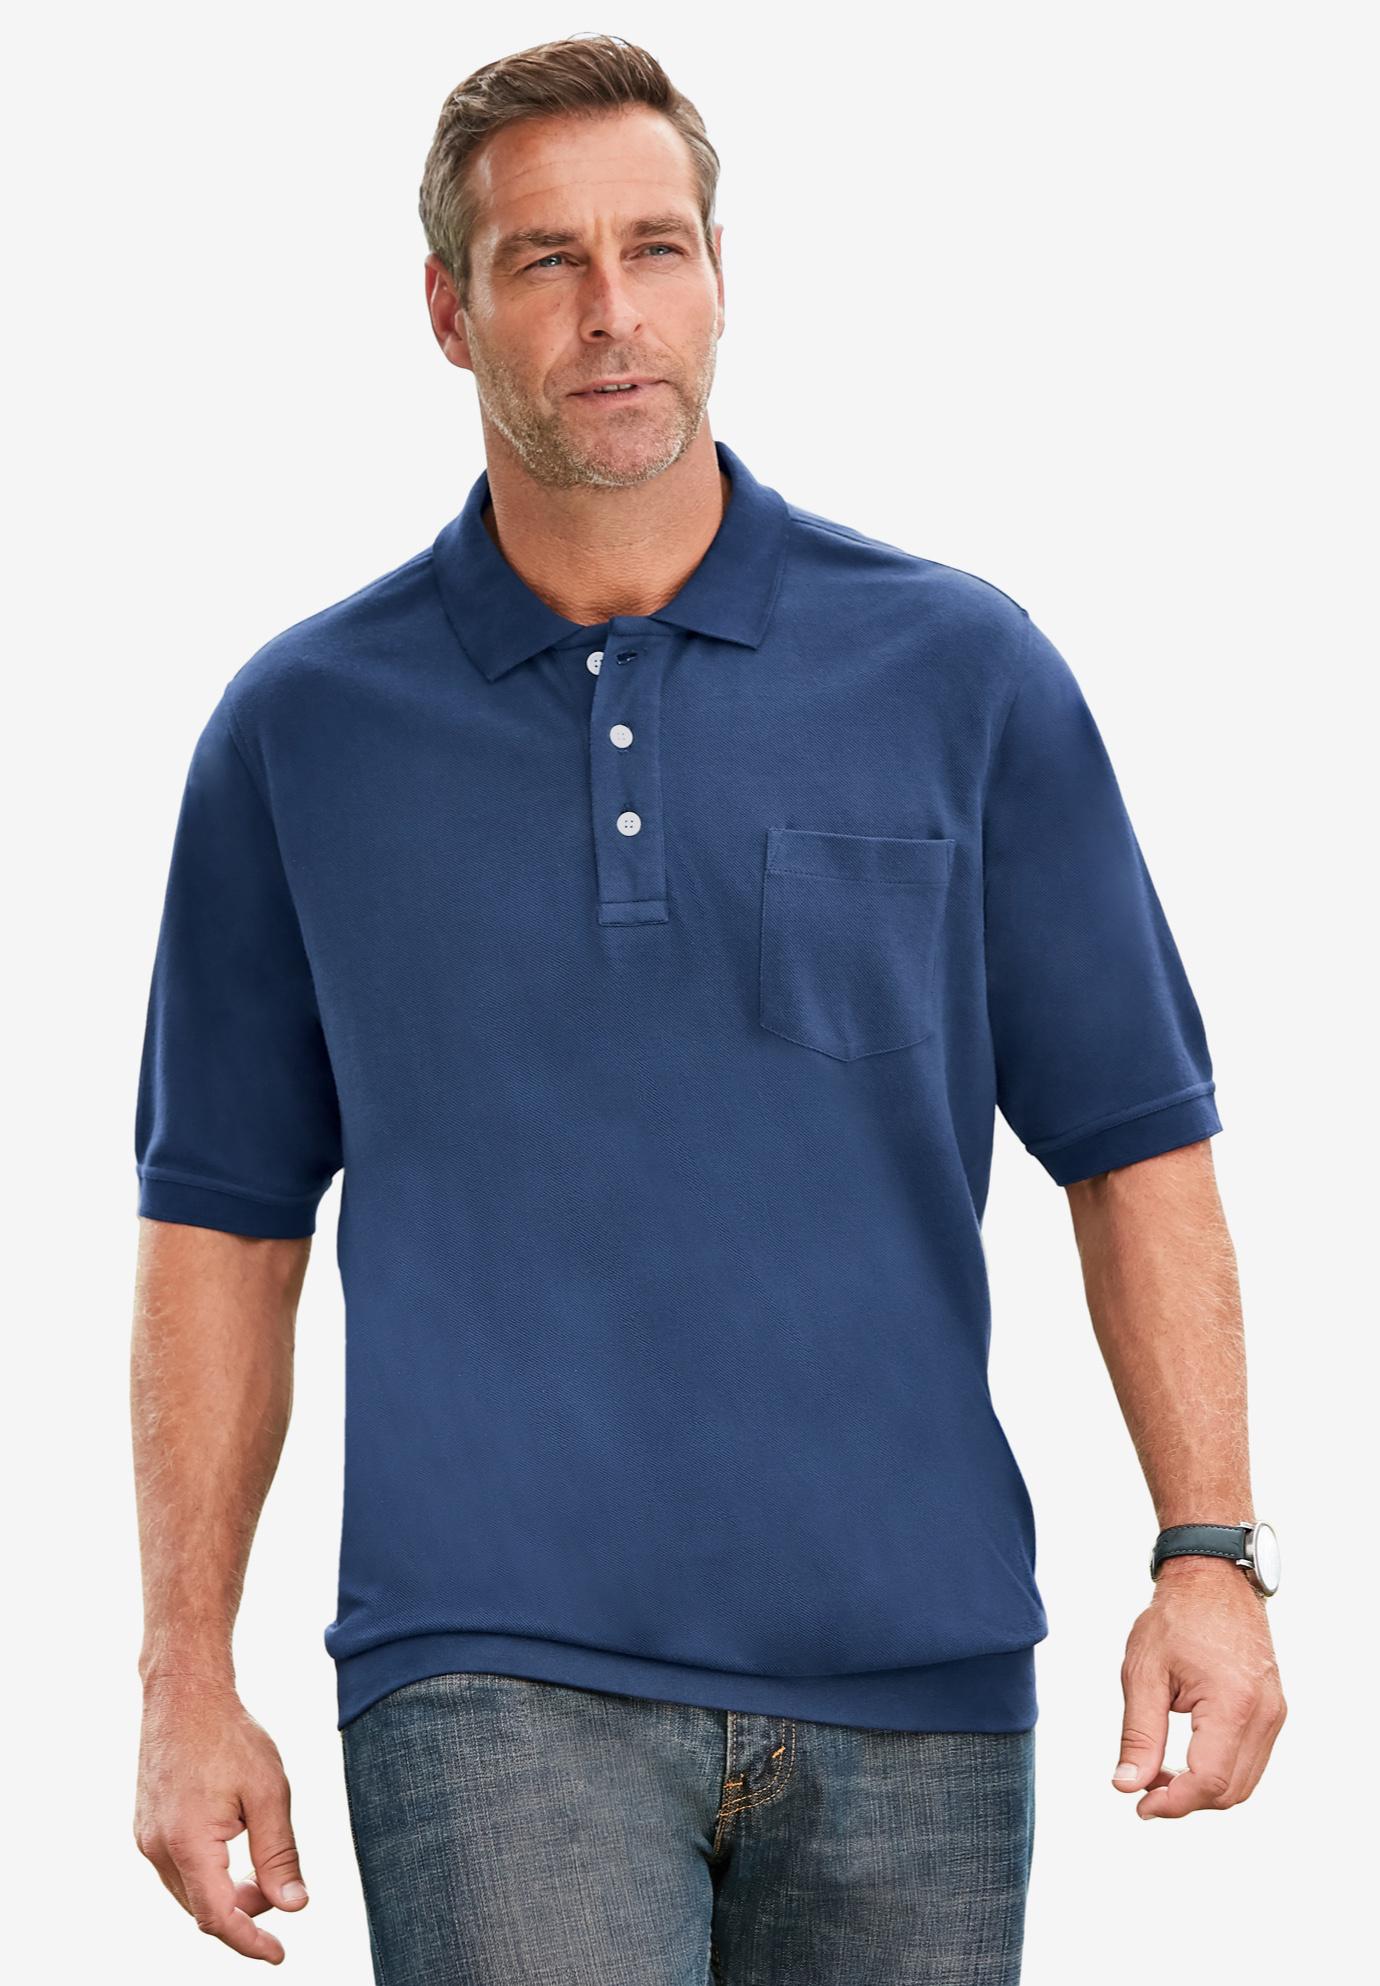 King Shirts Size